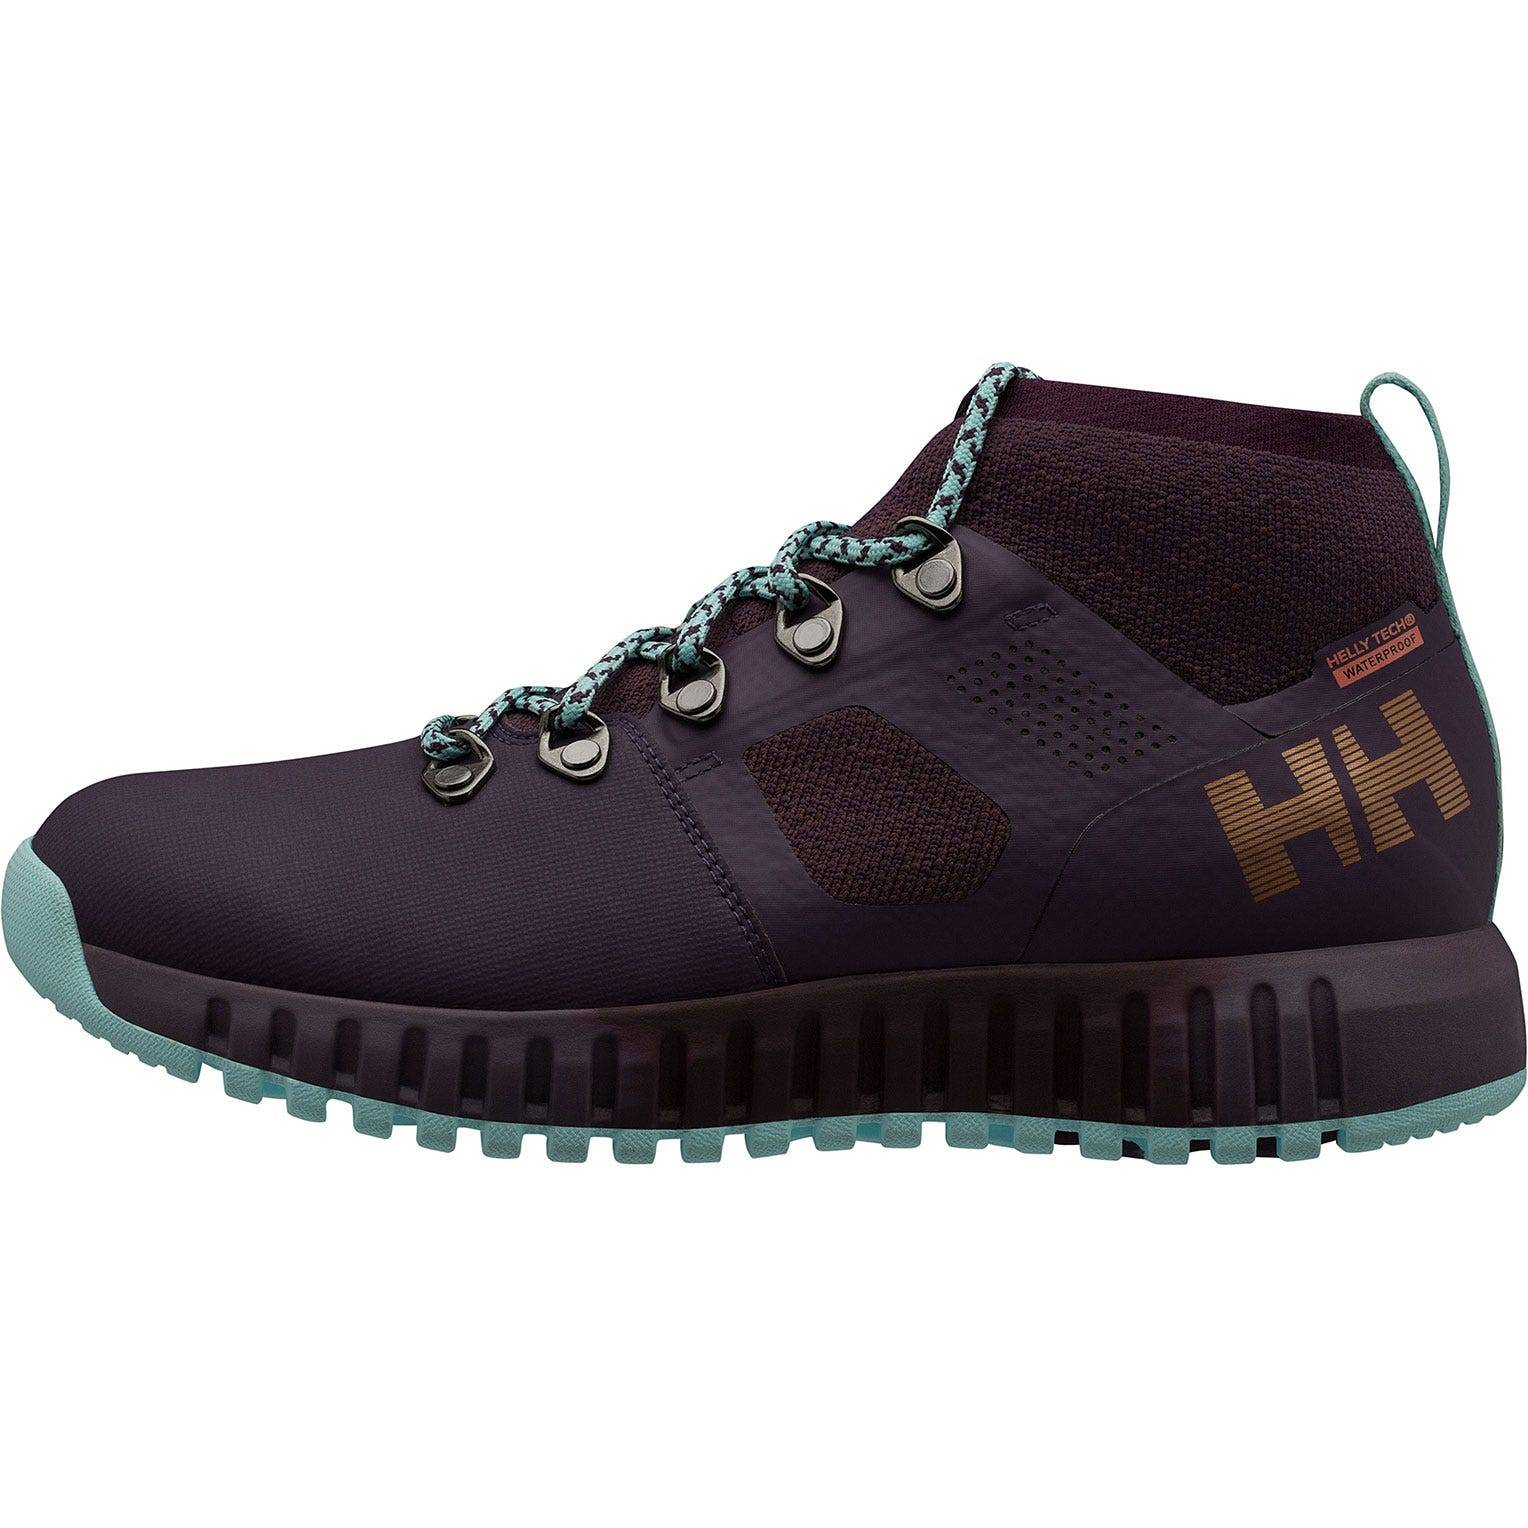 Helly Hansen W Vanir Canter Ht Womens Hiking Boot Purple 38.7/7.5